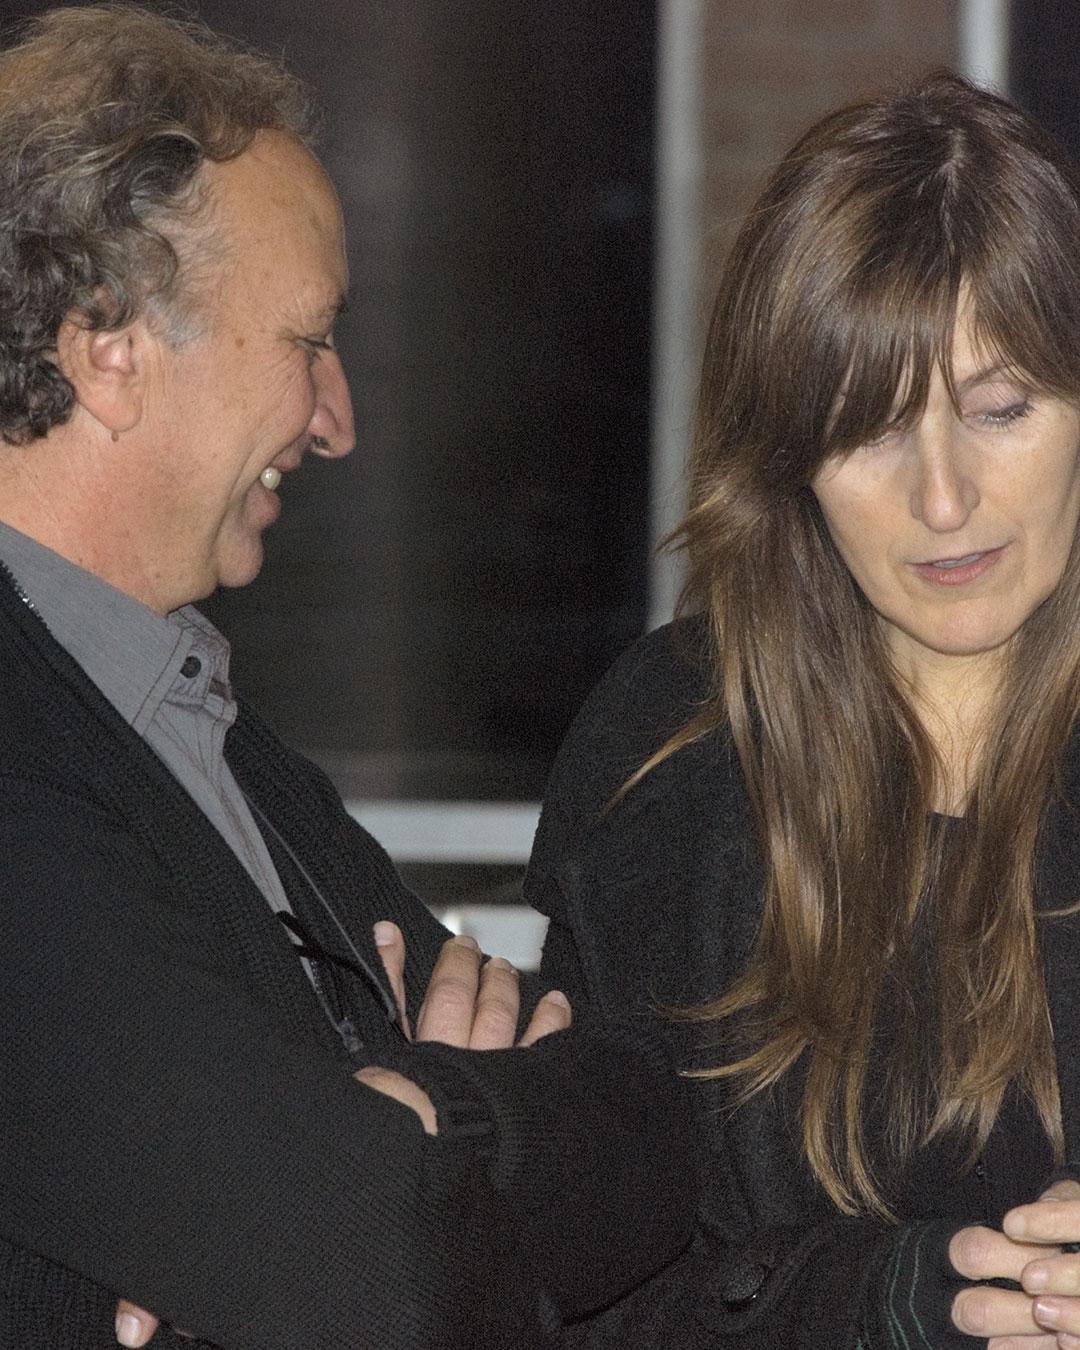 Ramon Puig Cuyàs and Montse Hernandez i Sala, 2010